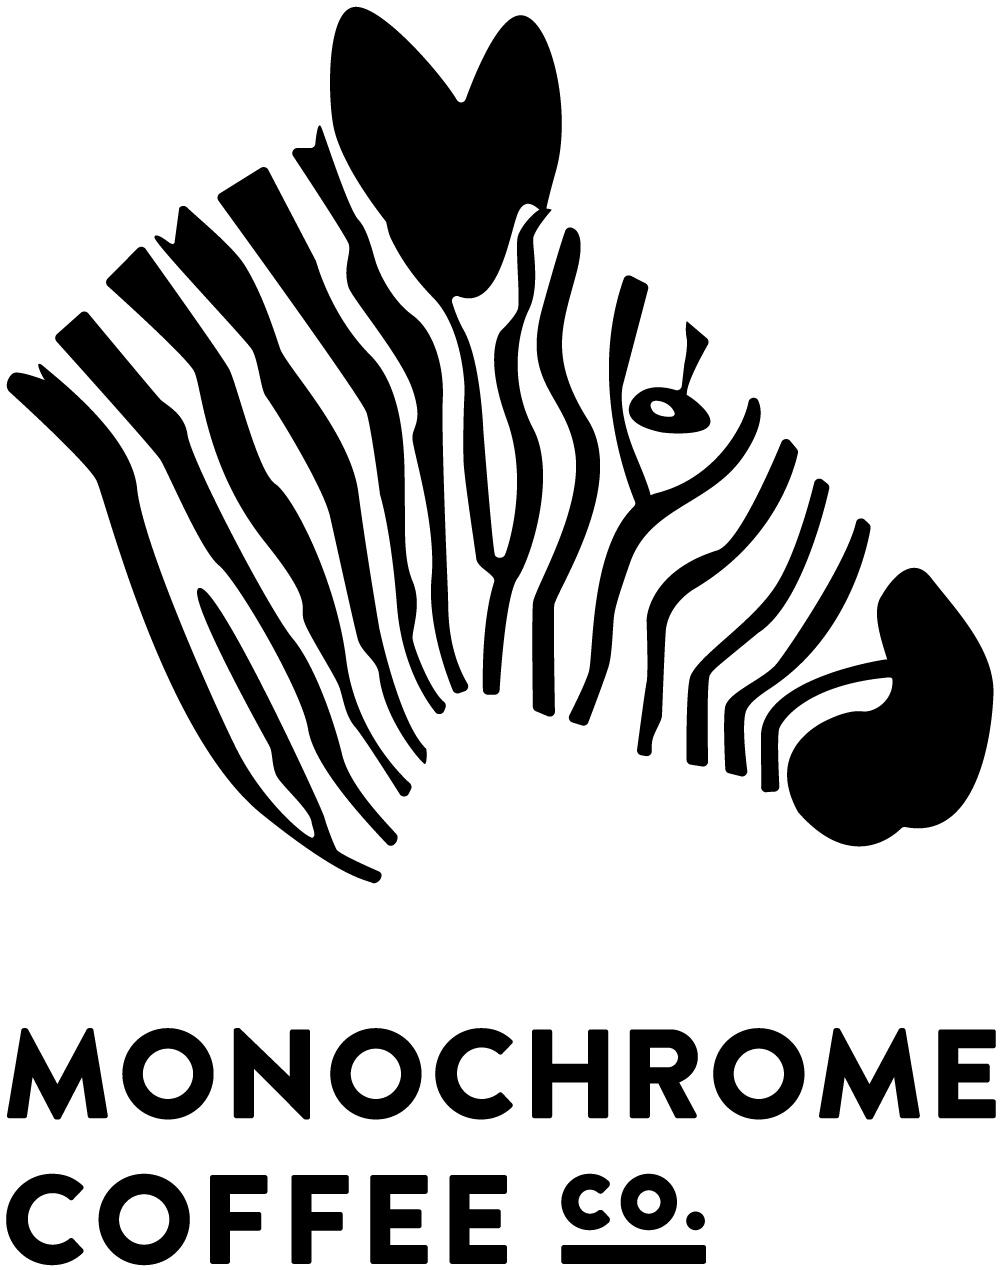 1.MonochromeCoffee_Logo_Final.jpg